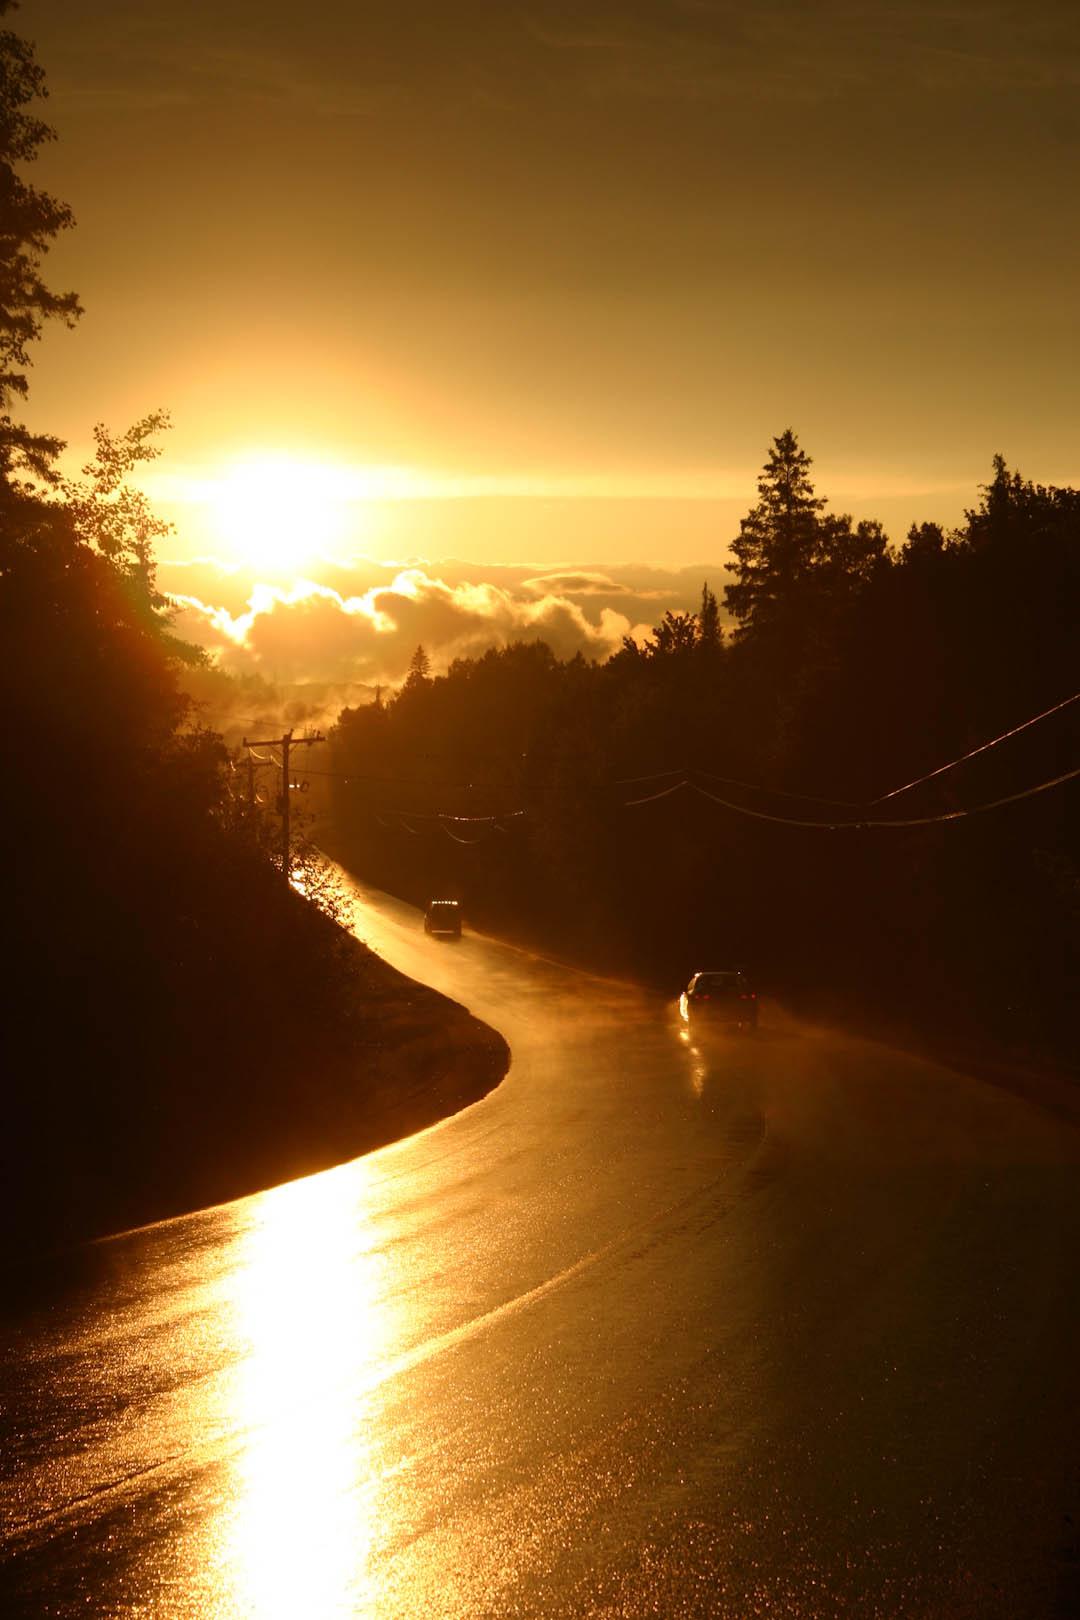 Sunset on the camp road -  photographer Travis Allison